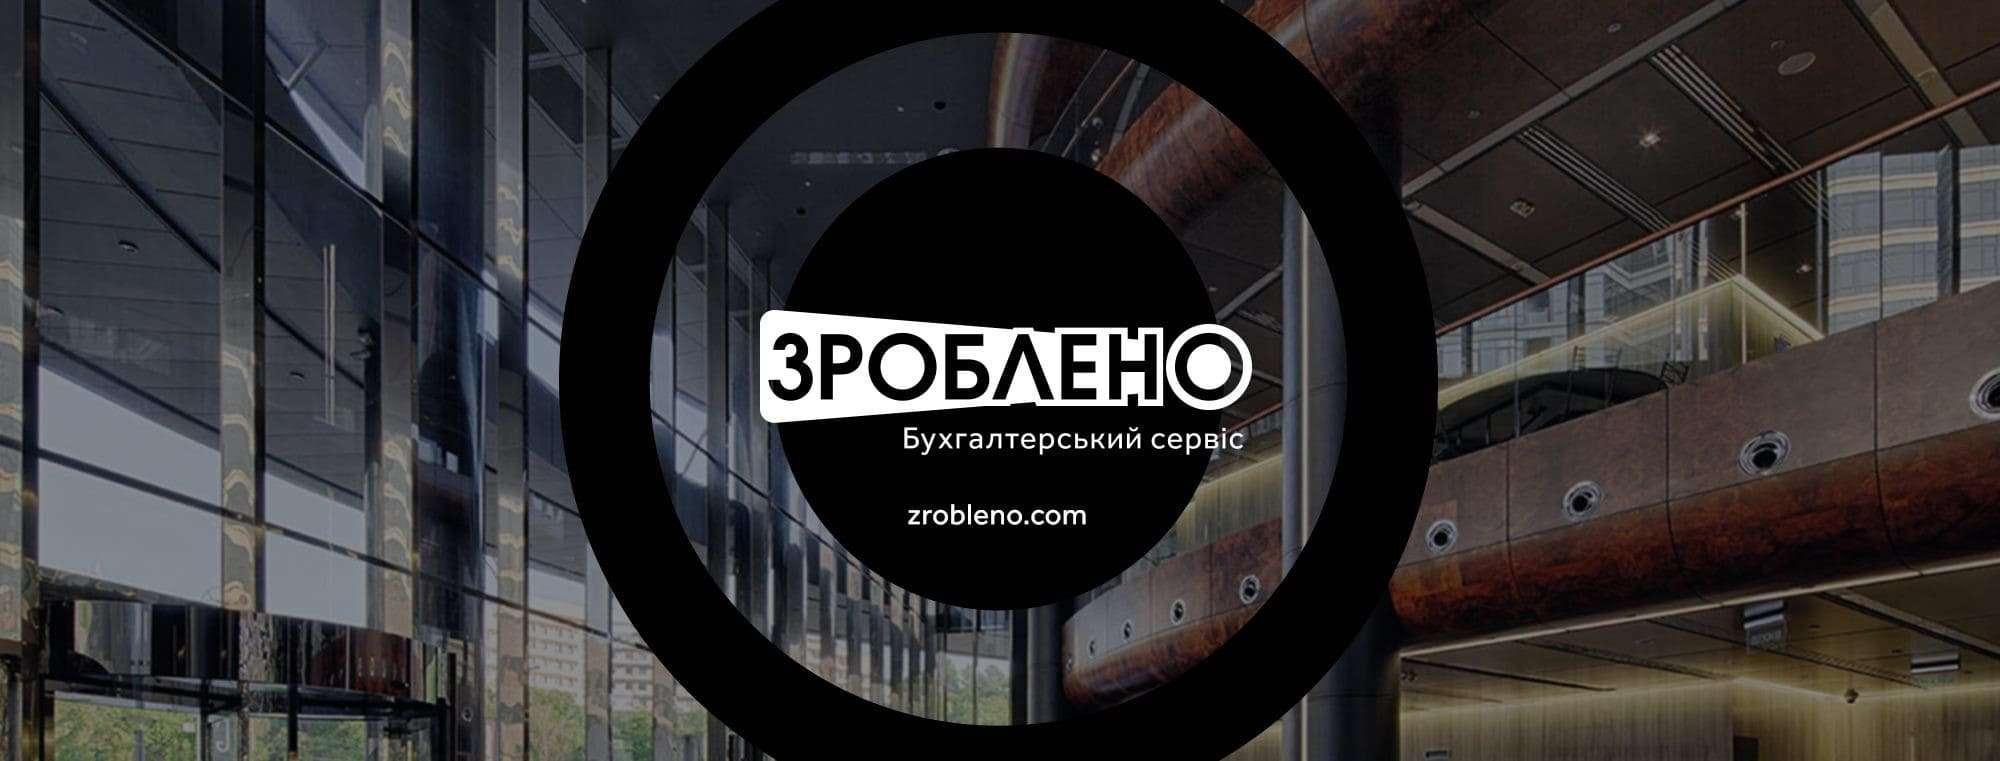 бухгалтерский аутсорсинг Киев